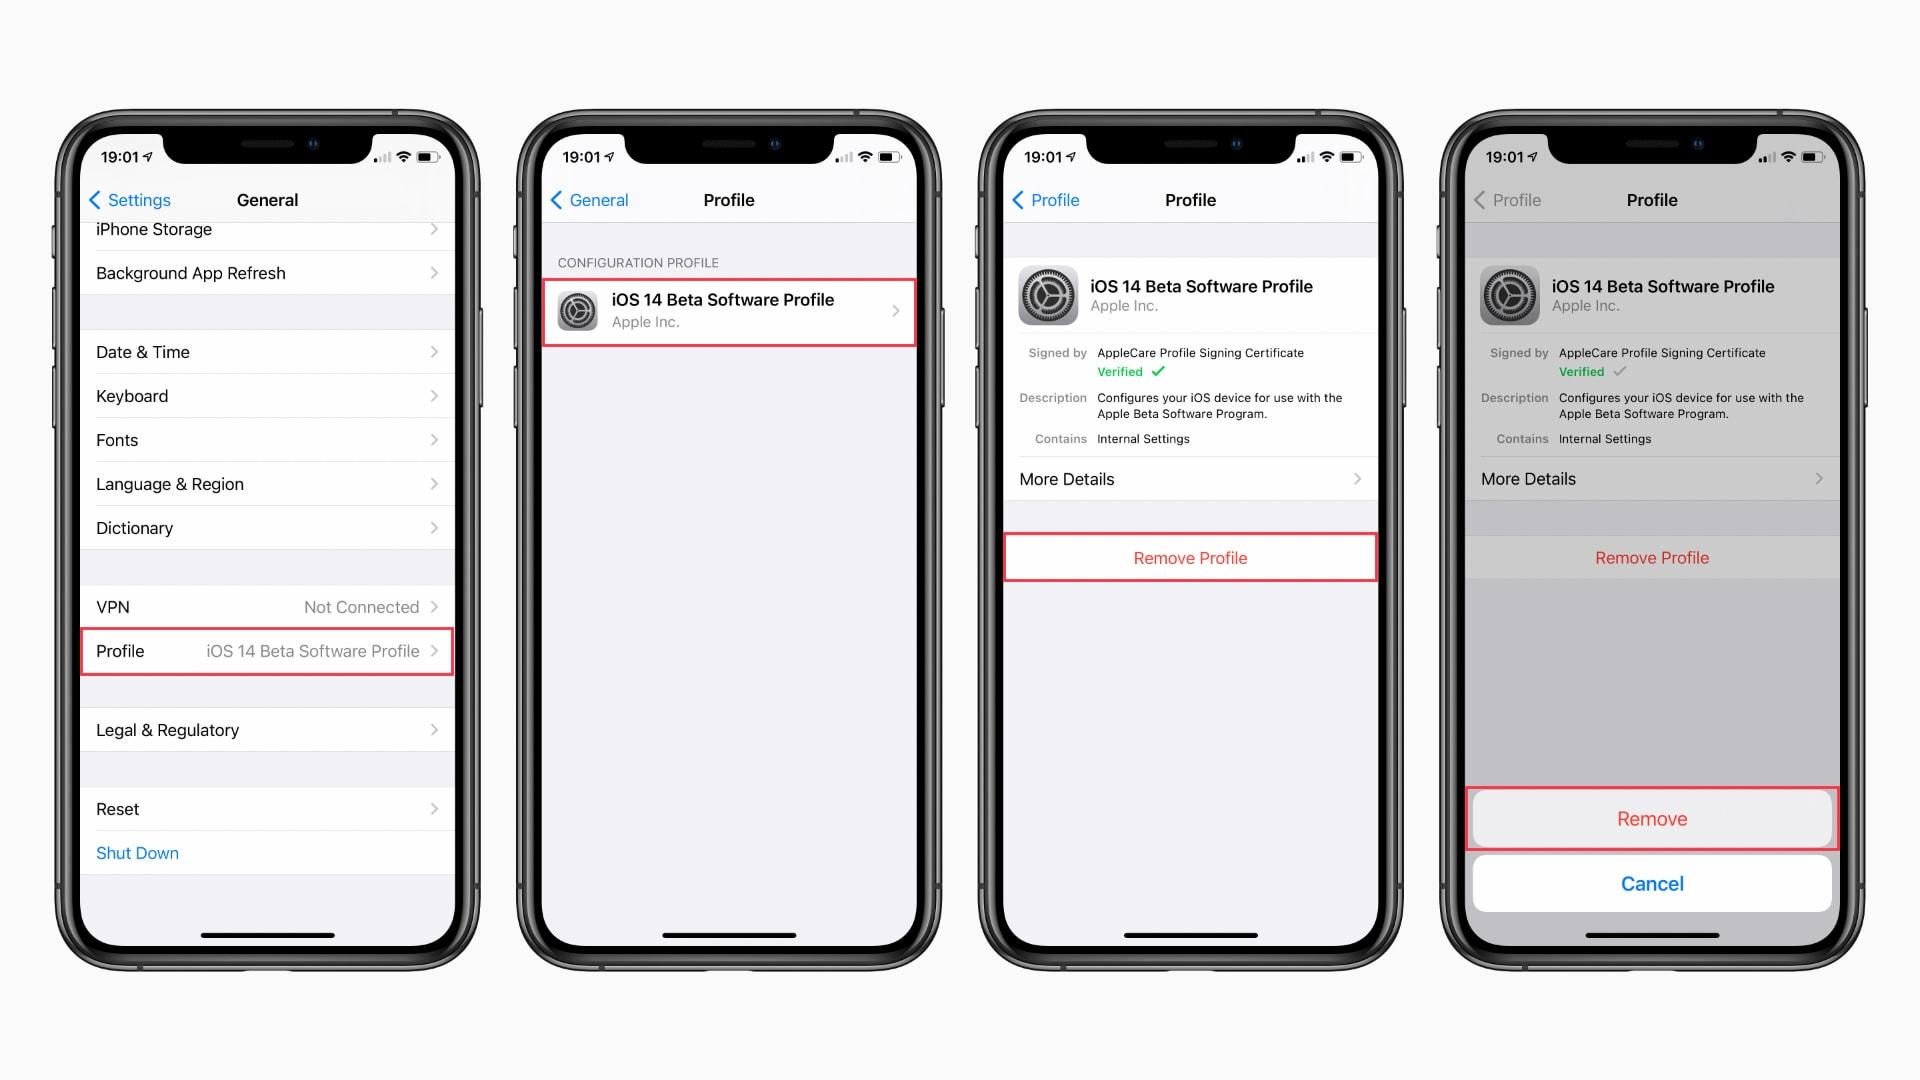 how to remove the iOS 14 beta profile